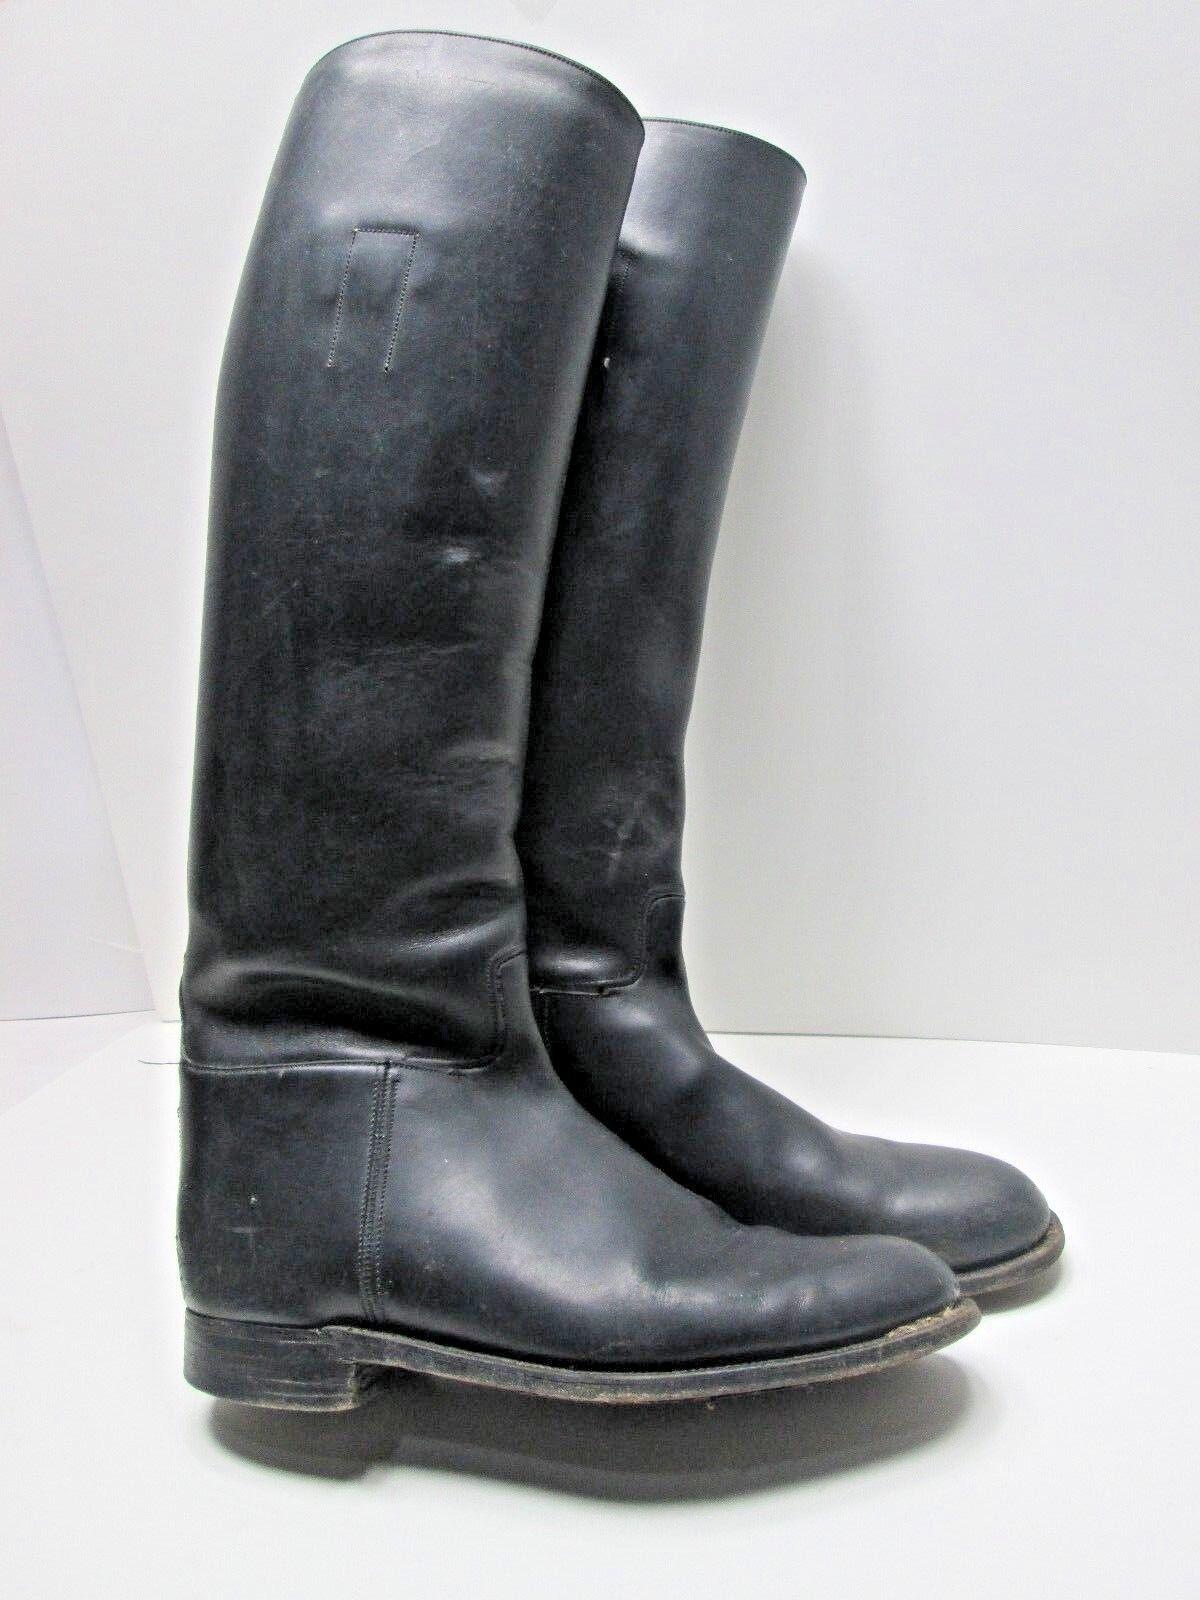 Vintage Handmade USA Womens 8 BLACK TALL EQUESTRIAN Leather RIDING DRESS BOOTS